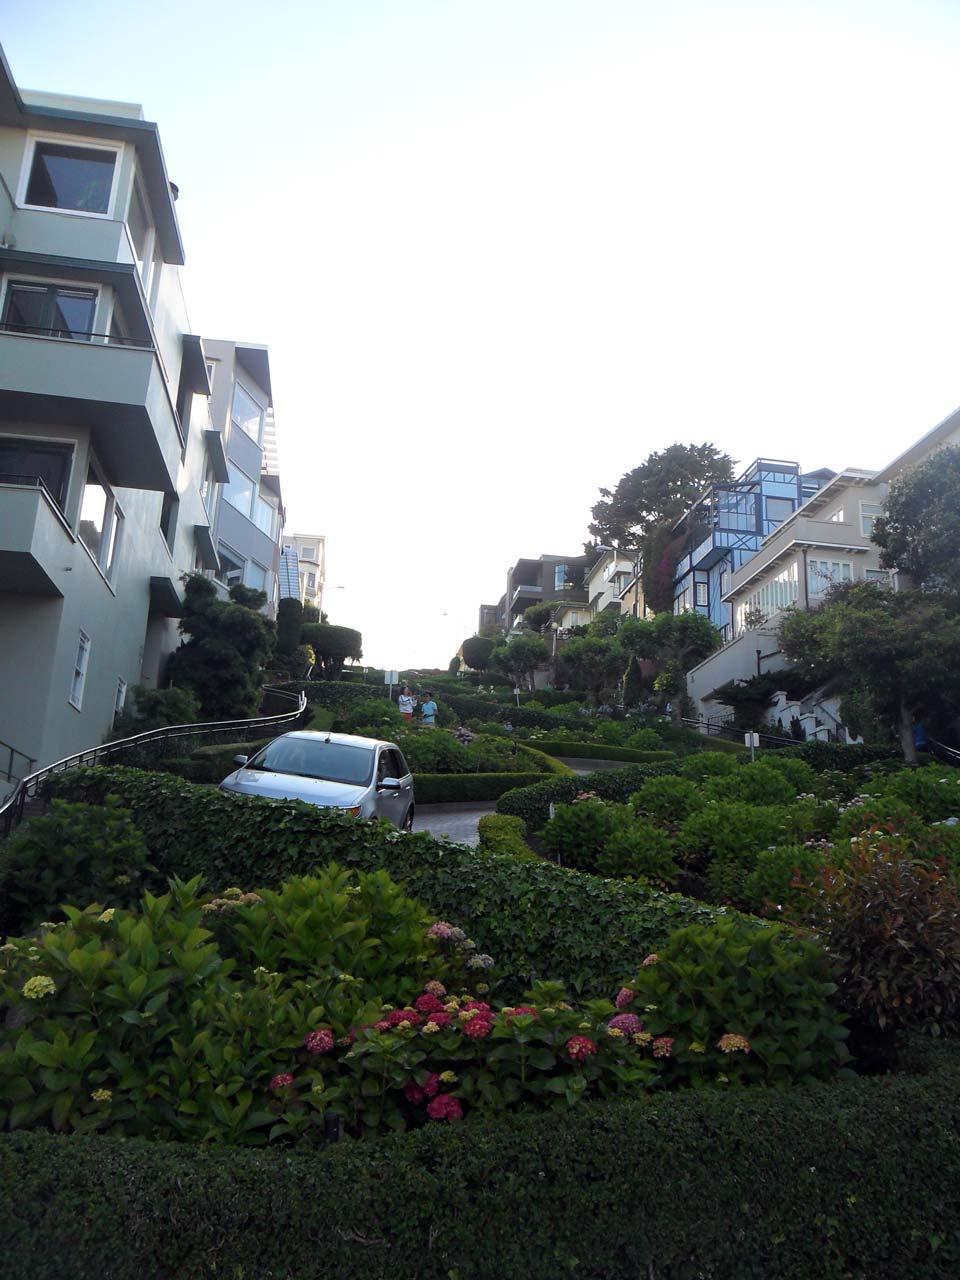 Meşhur zikzak yol..Lombard Street